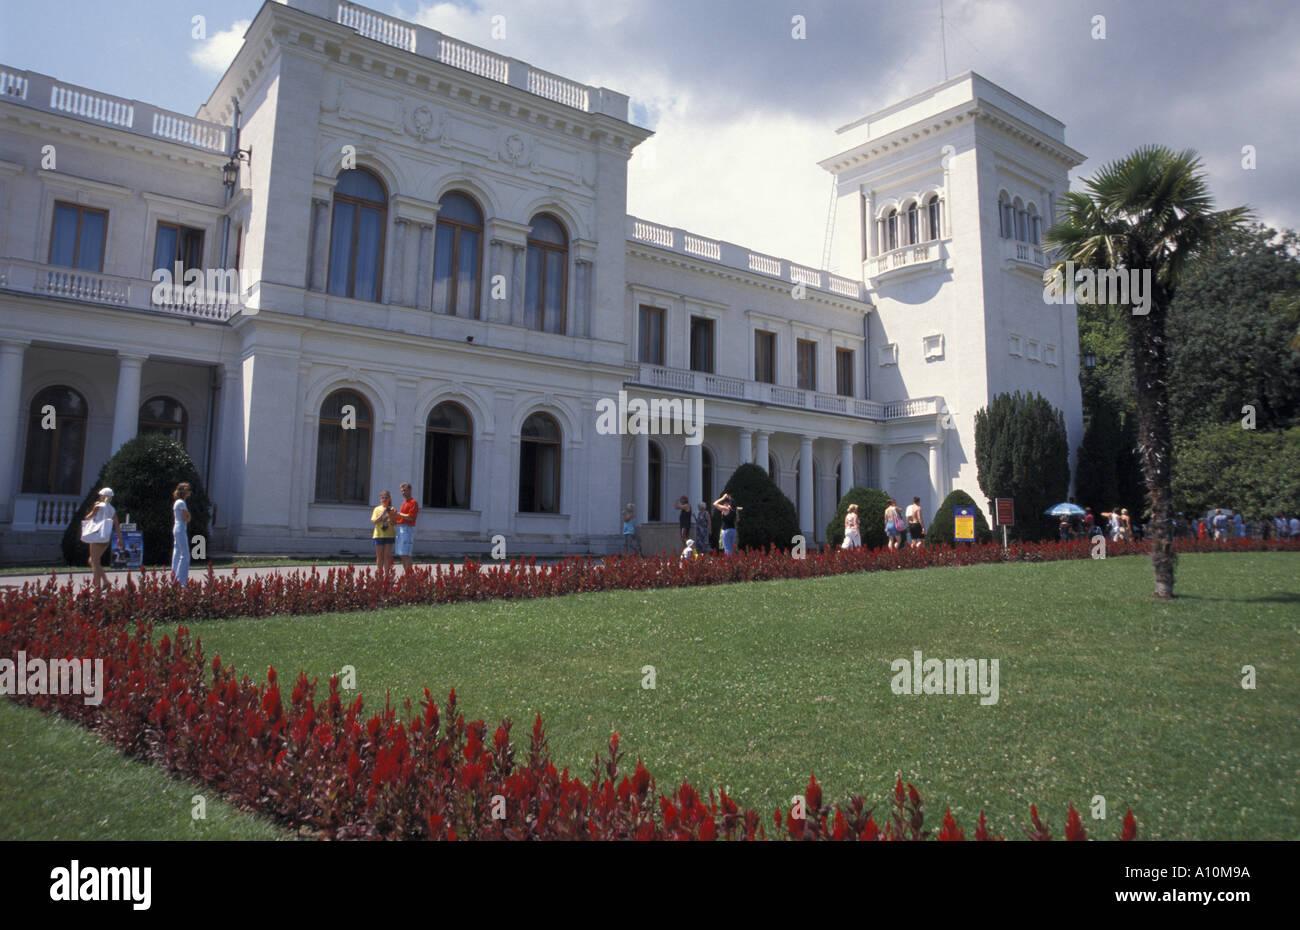 Crimea, Livadija palace - Stock Image